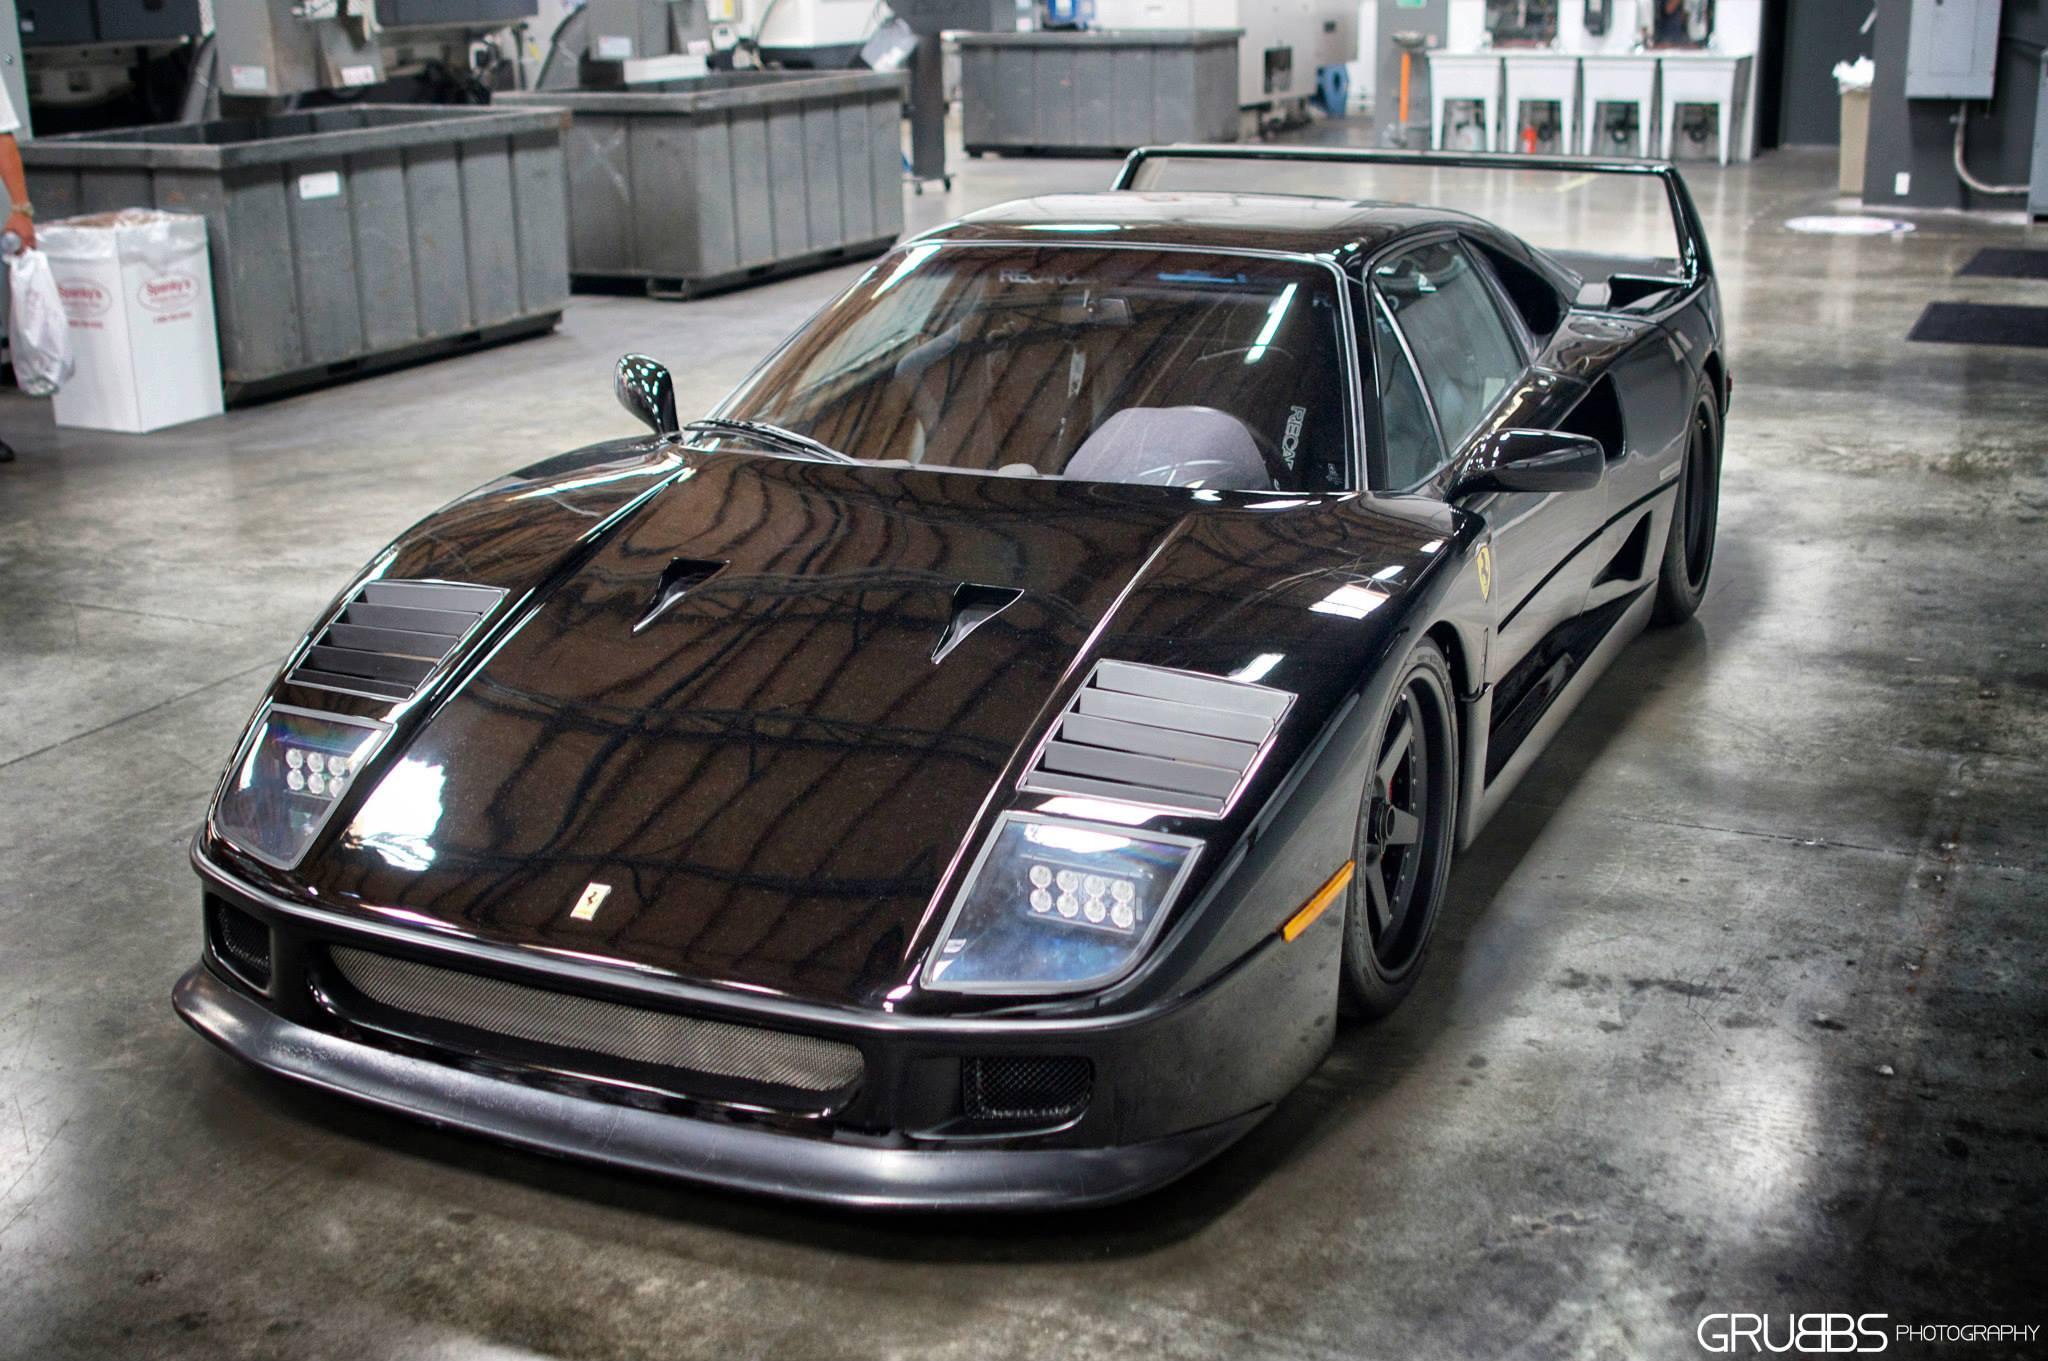 f40-black-61 Marvelous Ferrari Mondial 8 Te Koop Cars Trend